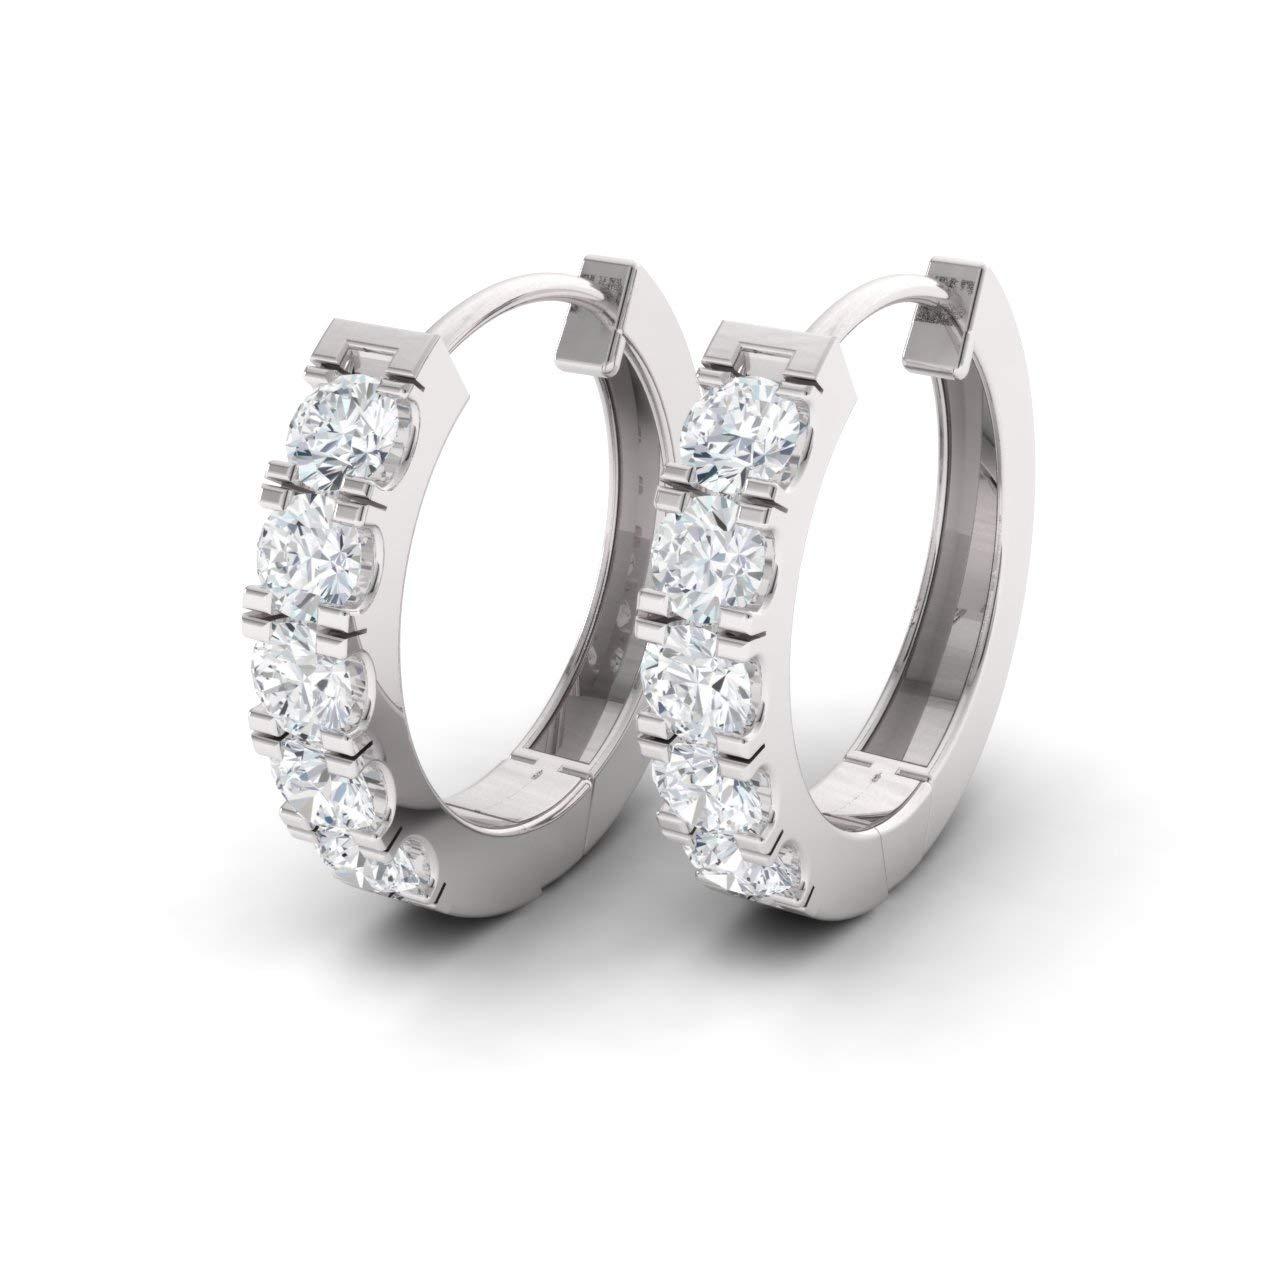 Diamondere Natural and Certified Diamond Huggies Earrings in 14K White Gold   1.11 Carat Earrings for Women